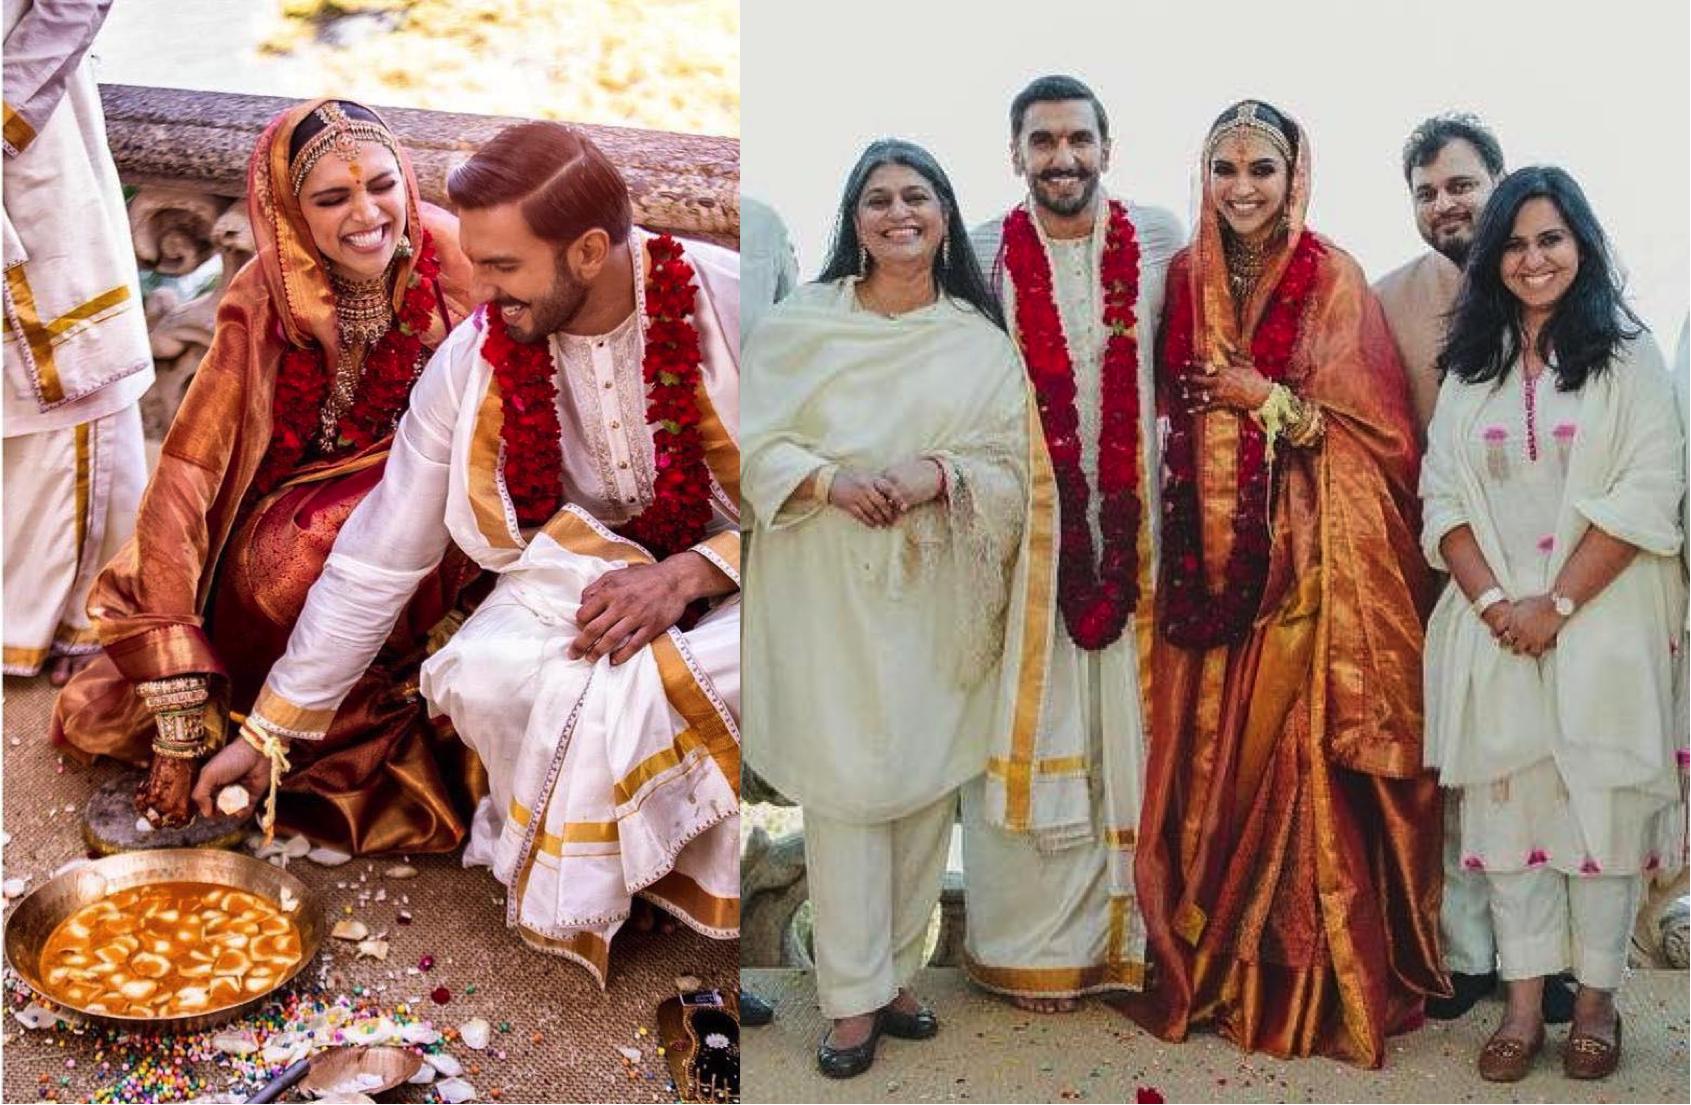 Konkani Wedding Dress Indian Wedding Photography Poses Indian Wedding Photography Indian Wedding